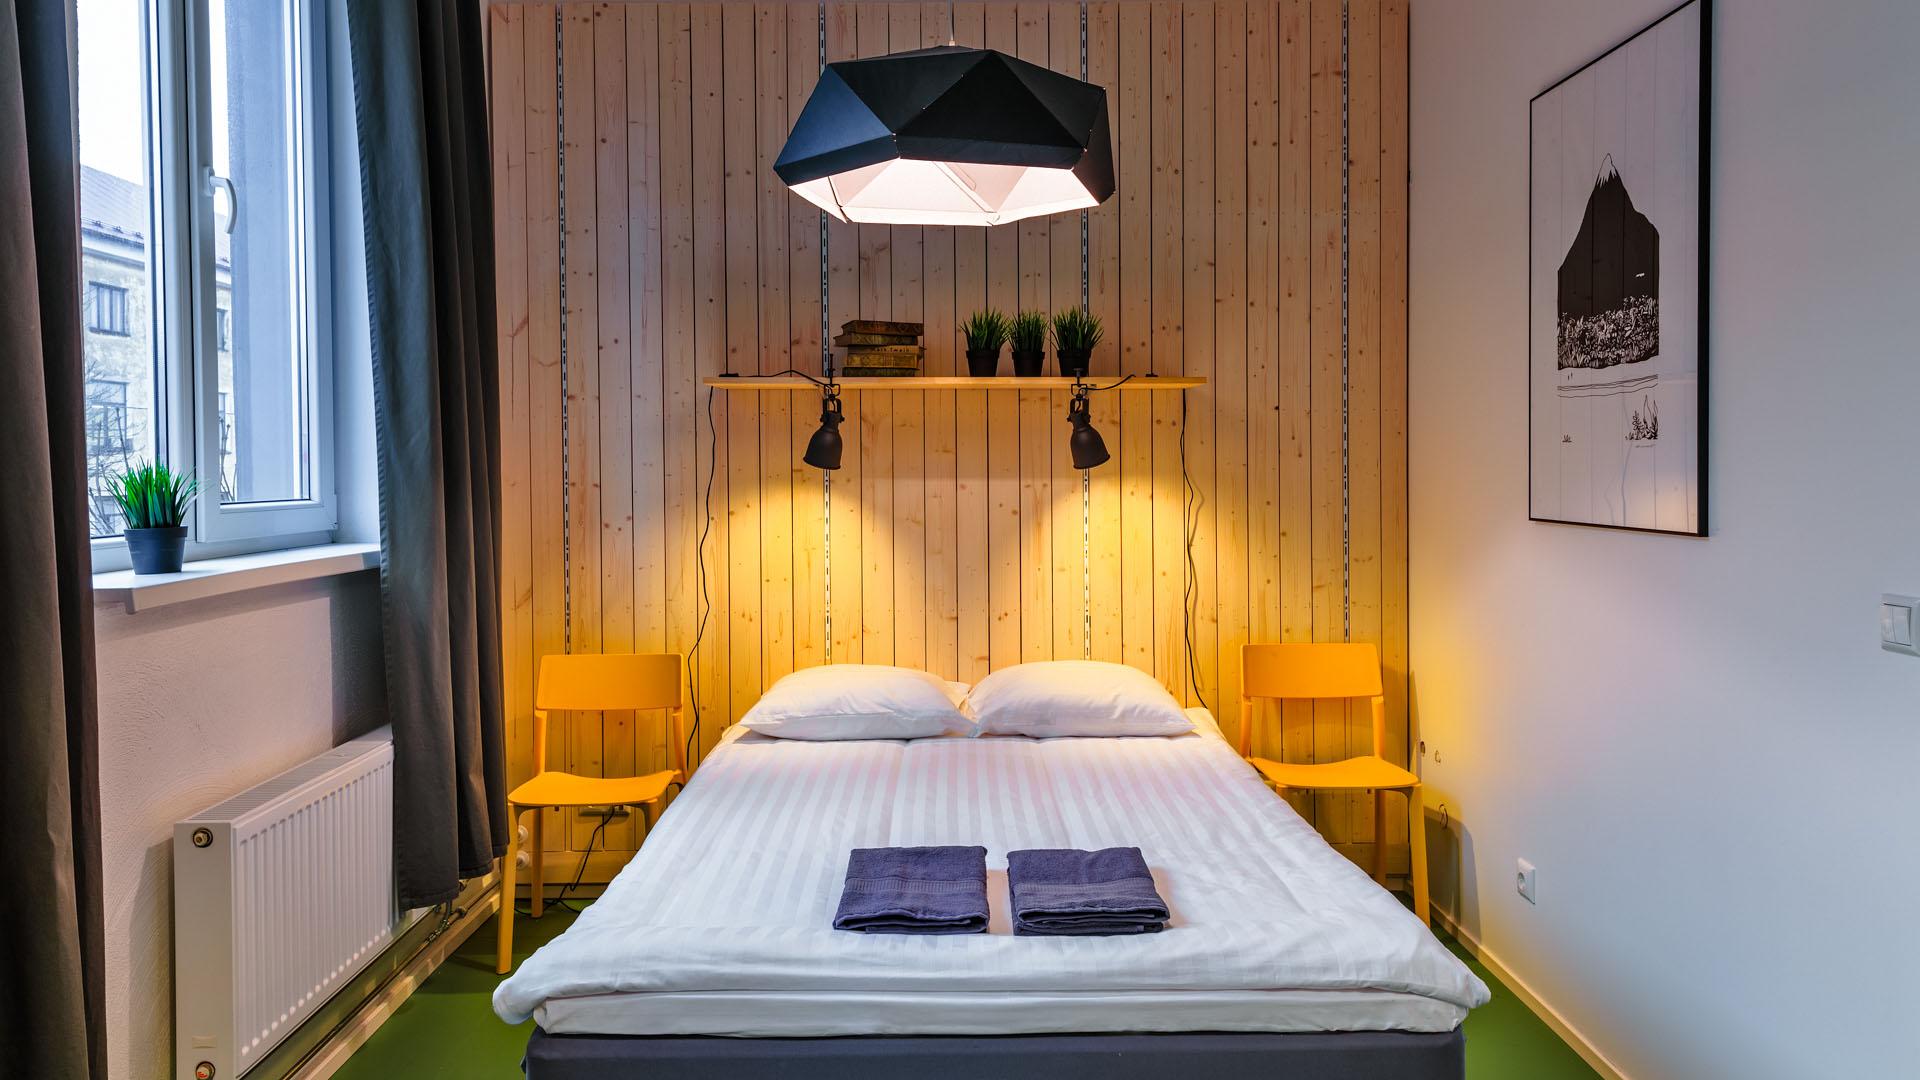 MILLIST VALIDA? Hotell, motell, hostel, butiikhostel – millist valida?